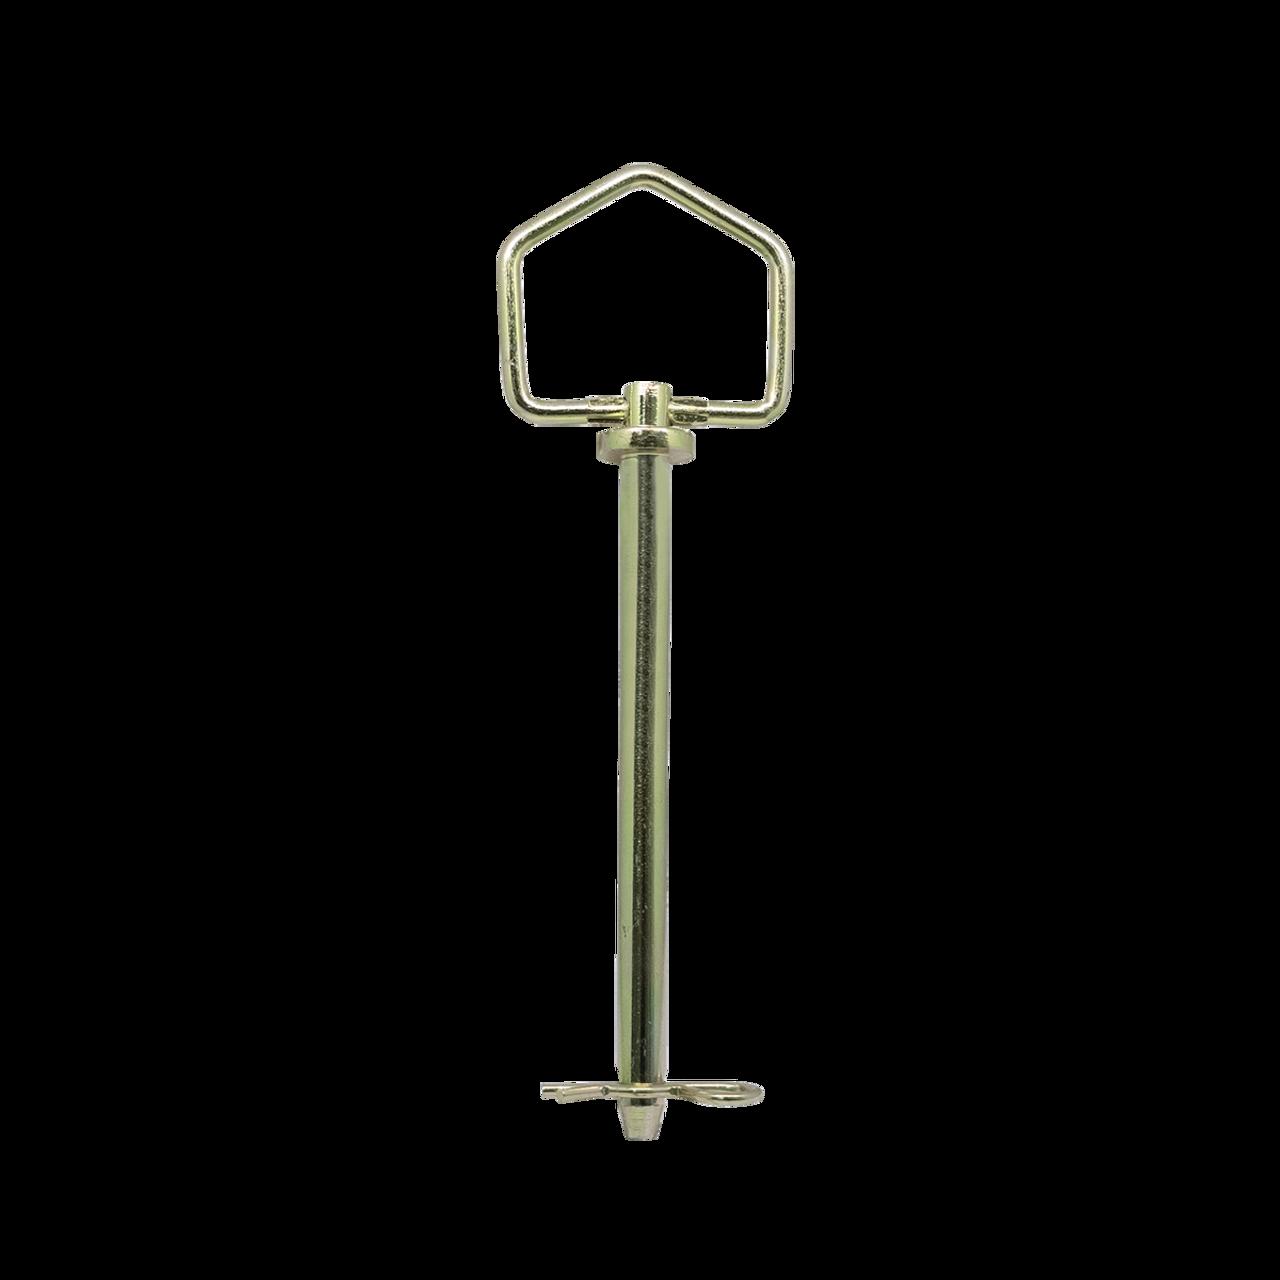 "HP126 --- Clevis Pin & Clip, 1/2"" Diameter"